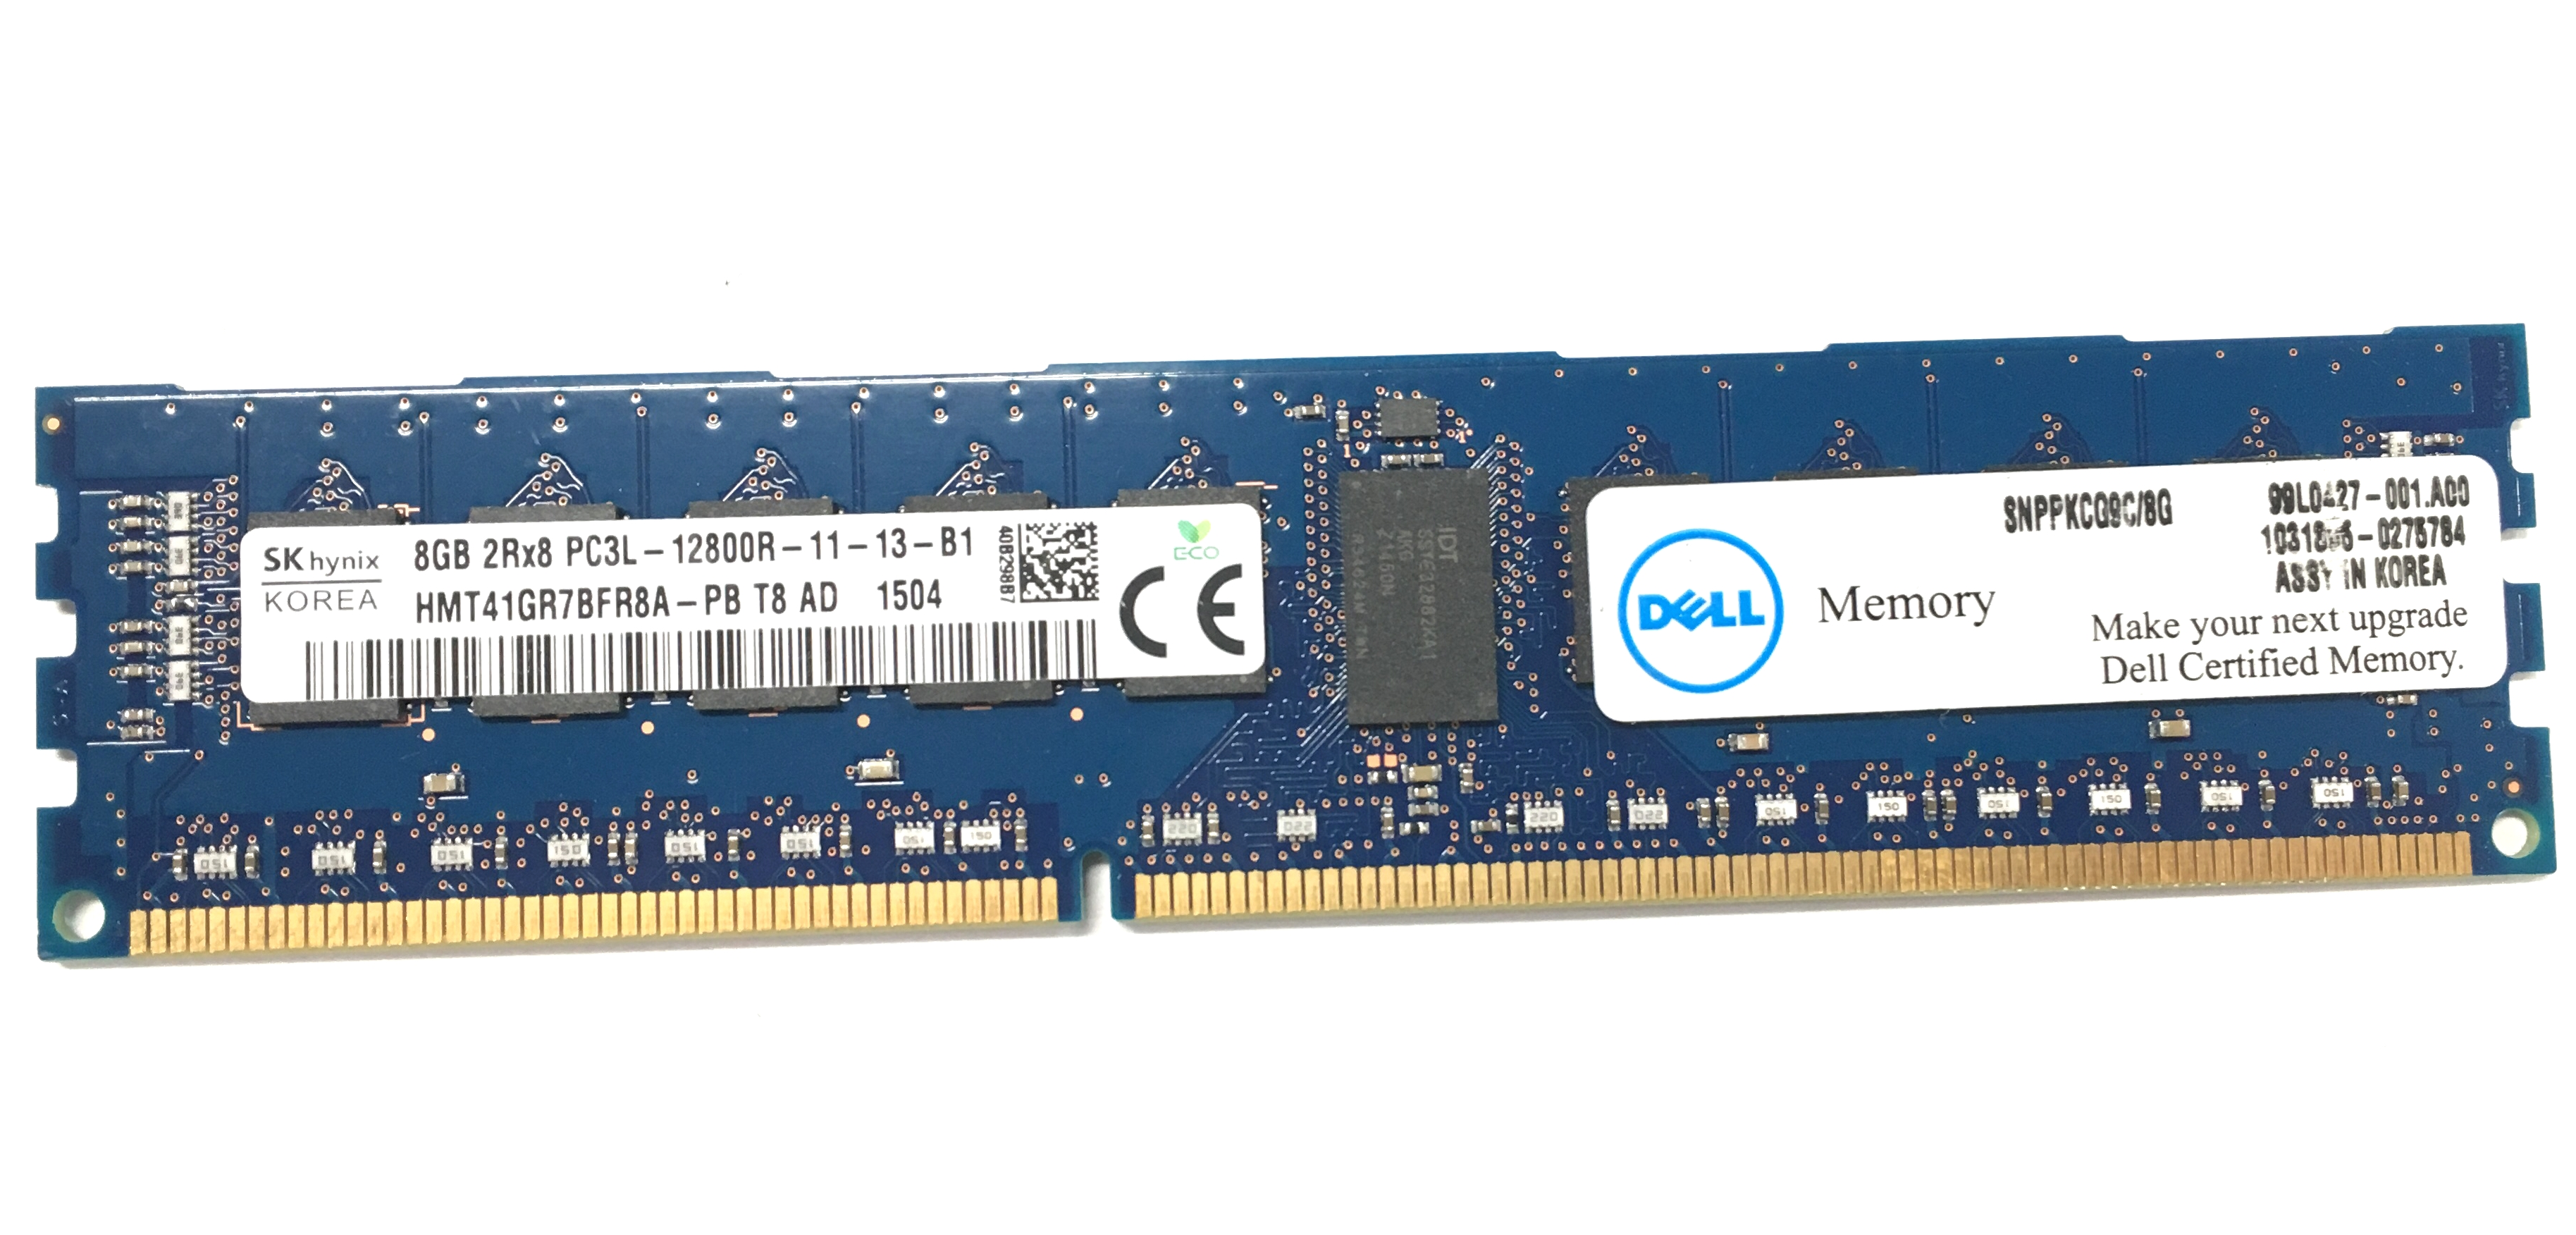 Dell 8GB 2Rx8 PC3L-12800R DDR3 1600MHz ECC REG Memory (SNPPKCG9C/8G)